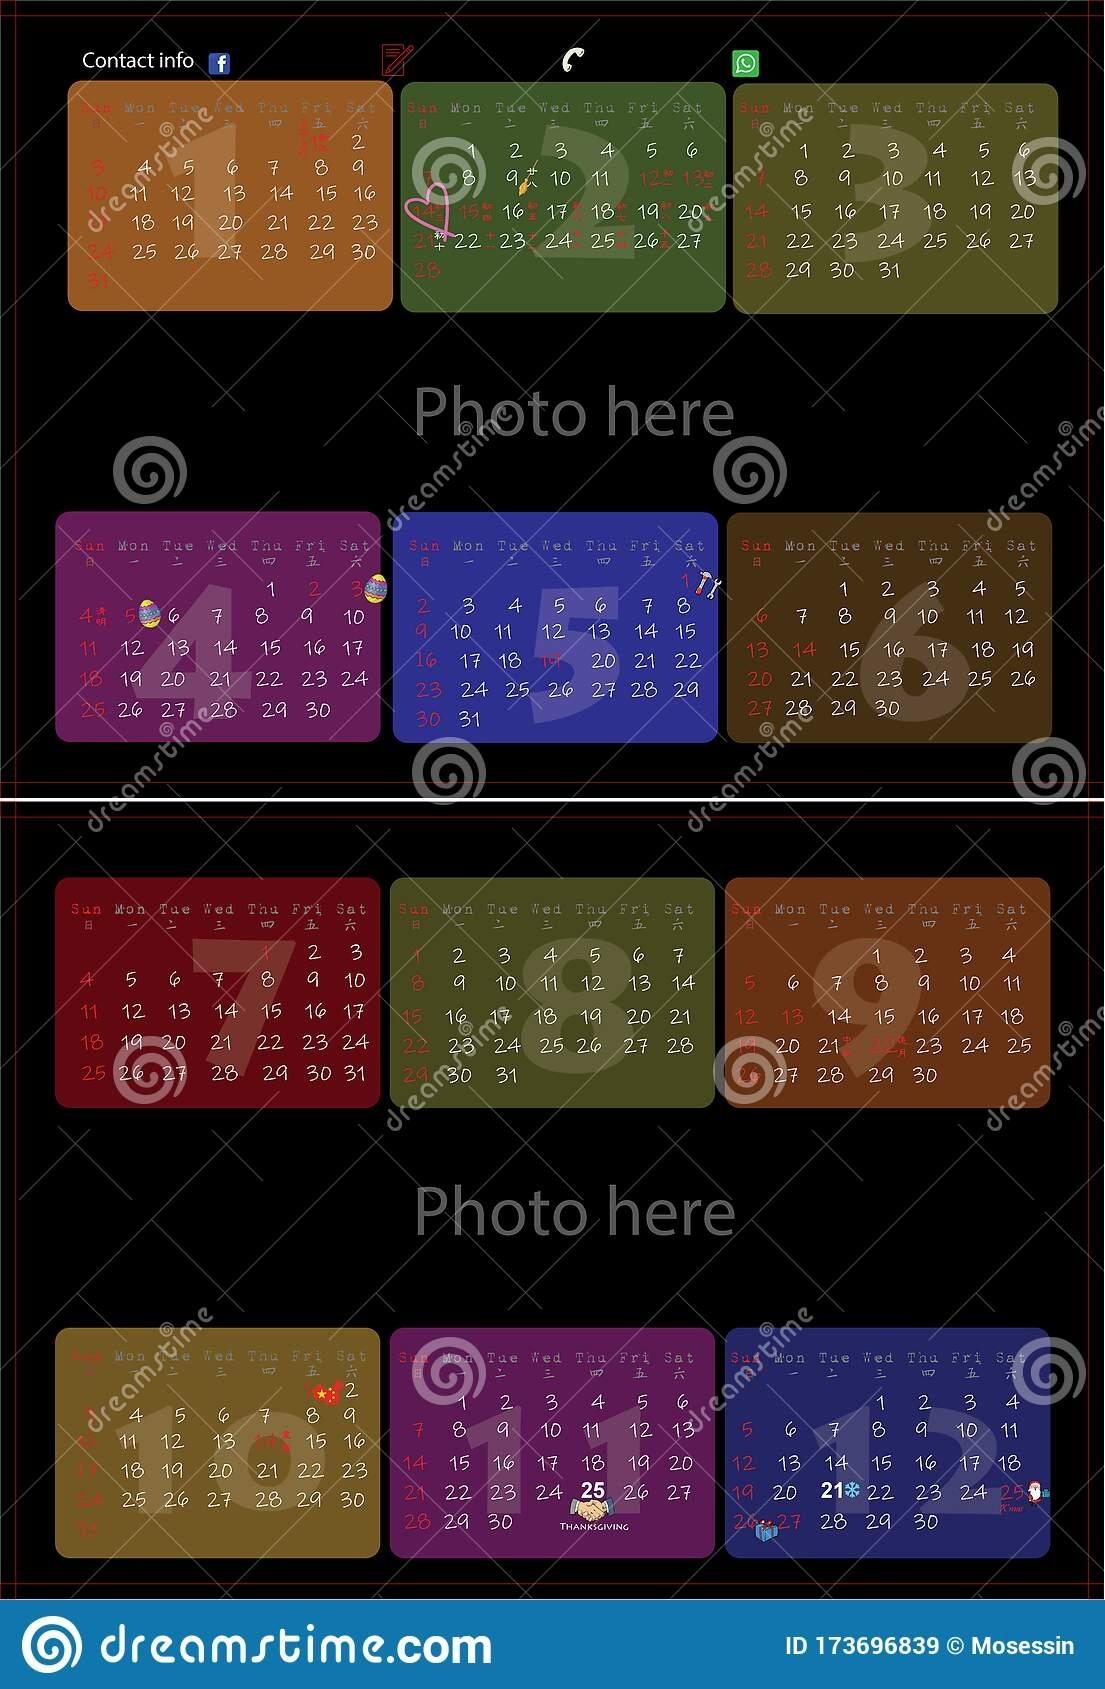 2021 Hk Calendar Template Vector Stock Vector - Illustration Hong Kong Calendar 2021 Template